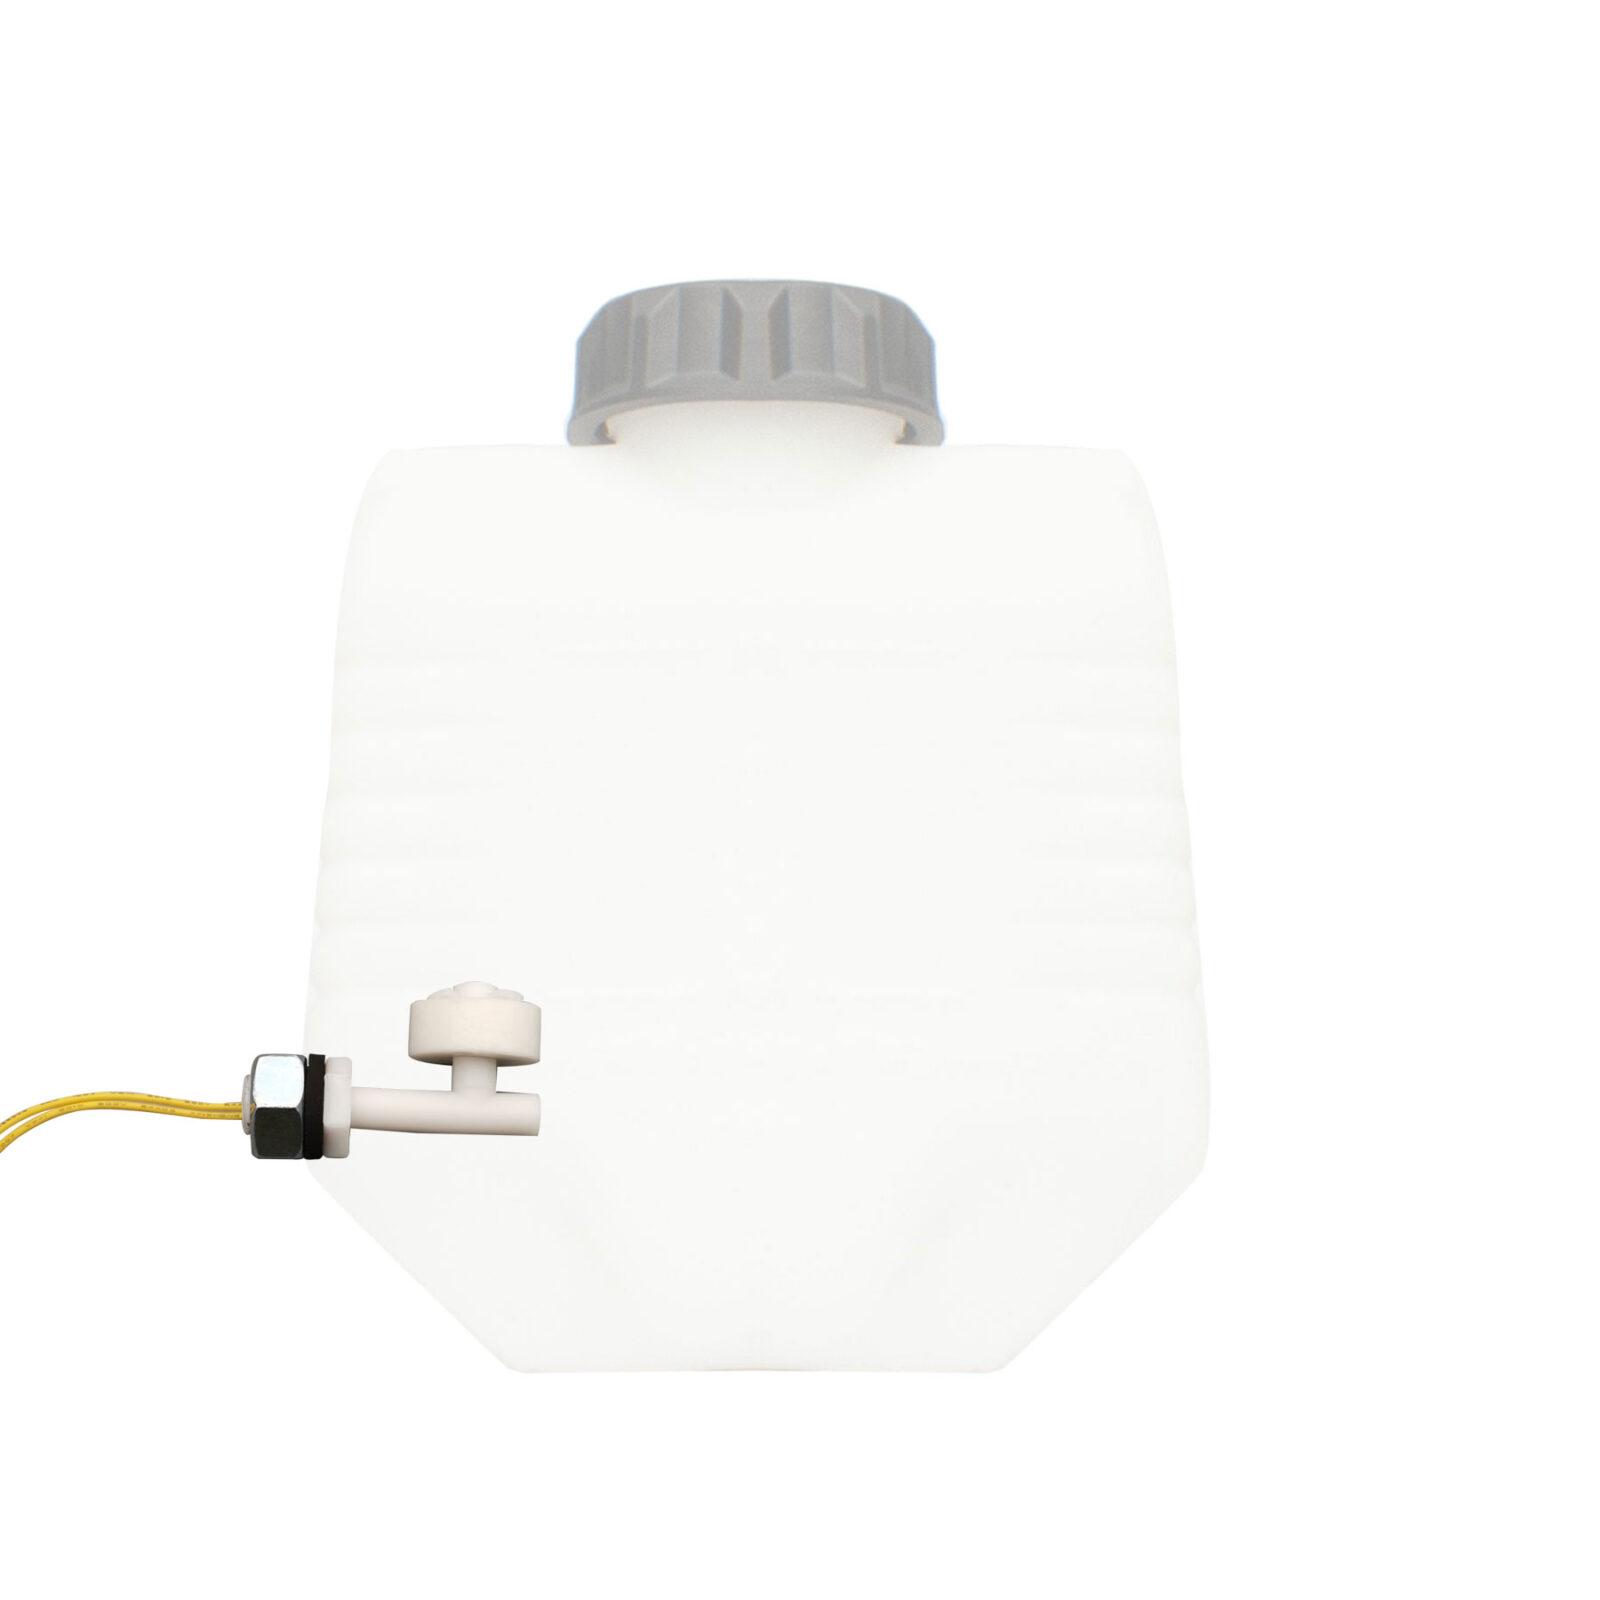 how to mount tank level sensor